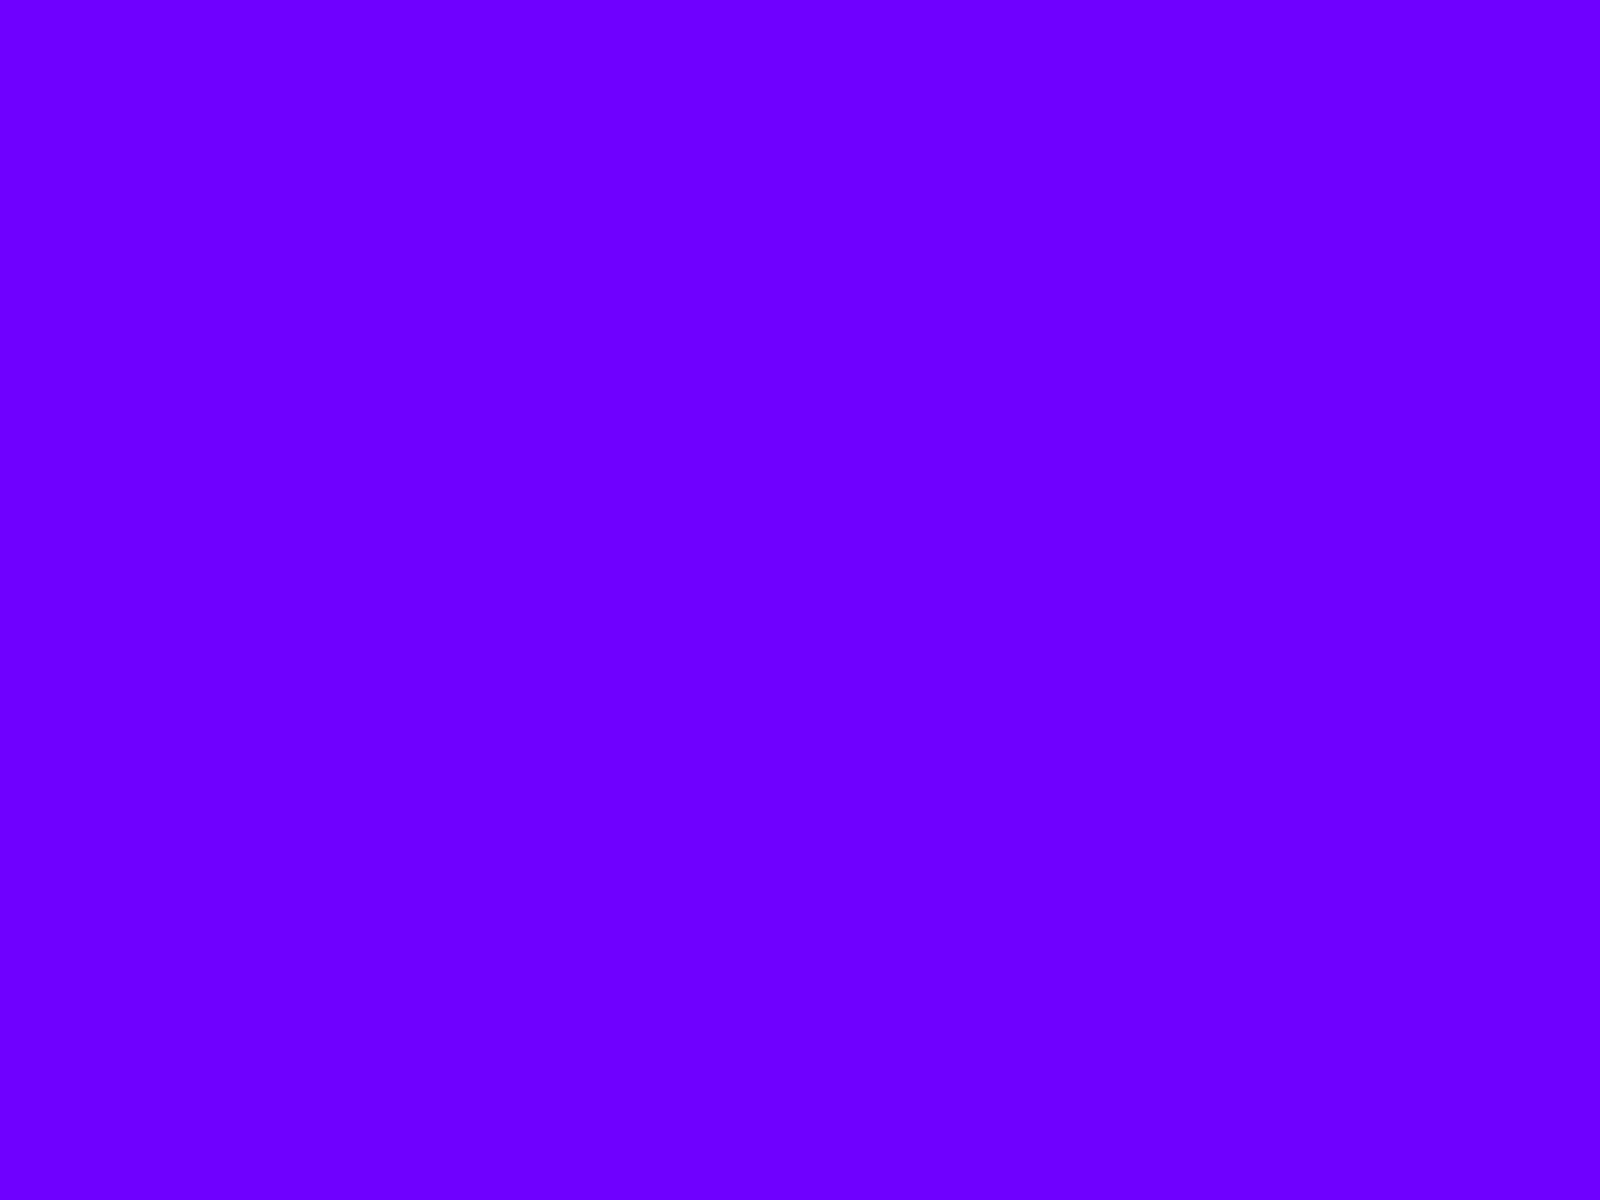 1600x1200 Electric Indigo Solid Color Background